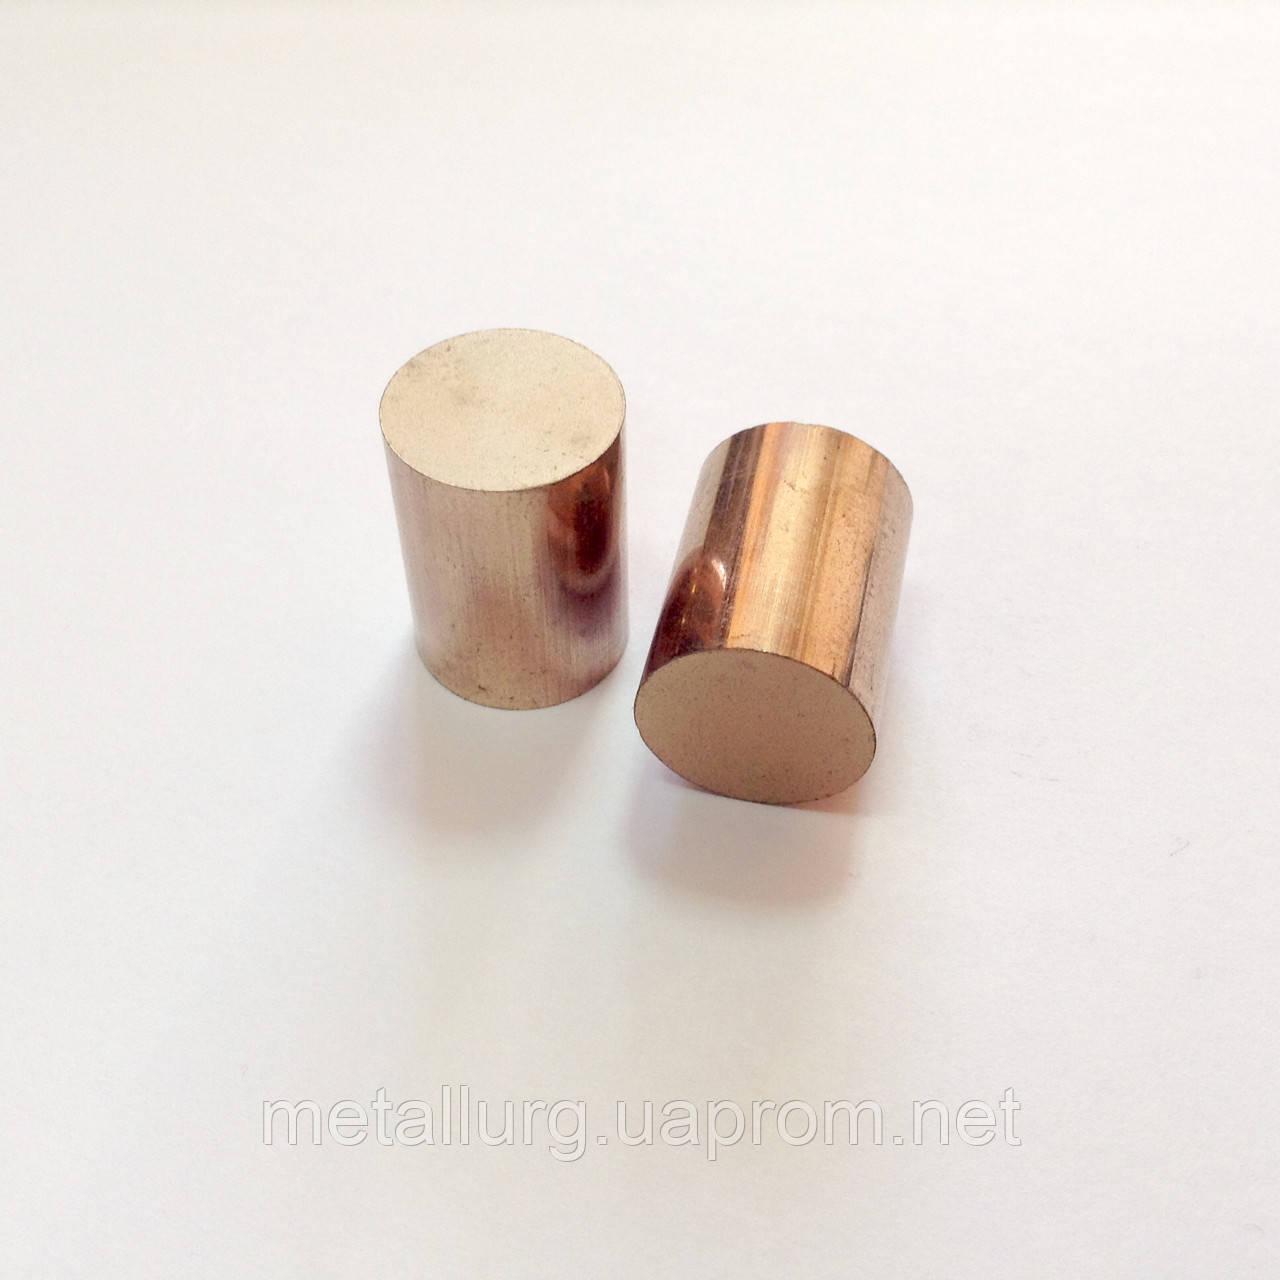 Круг бронзографитовый диаметр 16 мм х 20 мм - ООО НПФ «Металлург» в Харькове